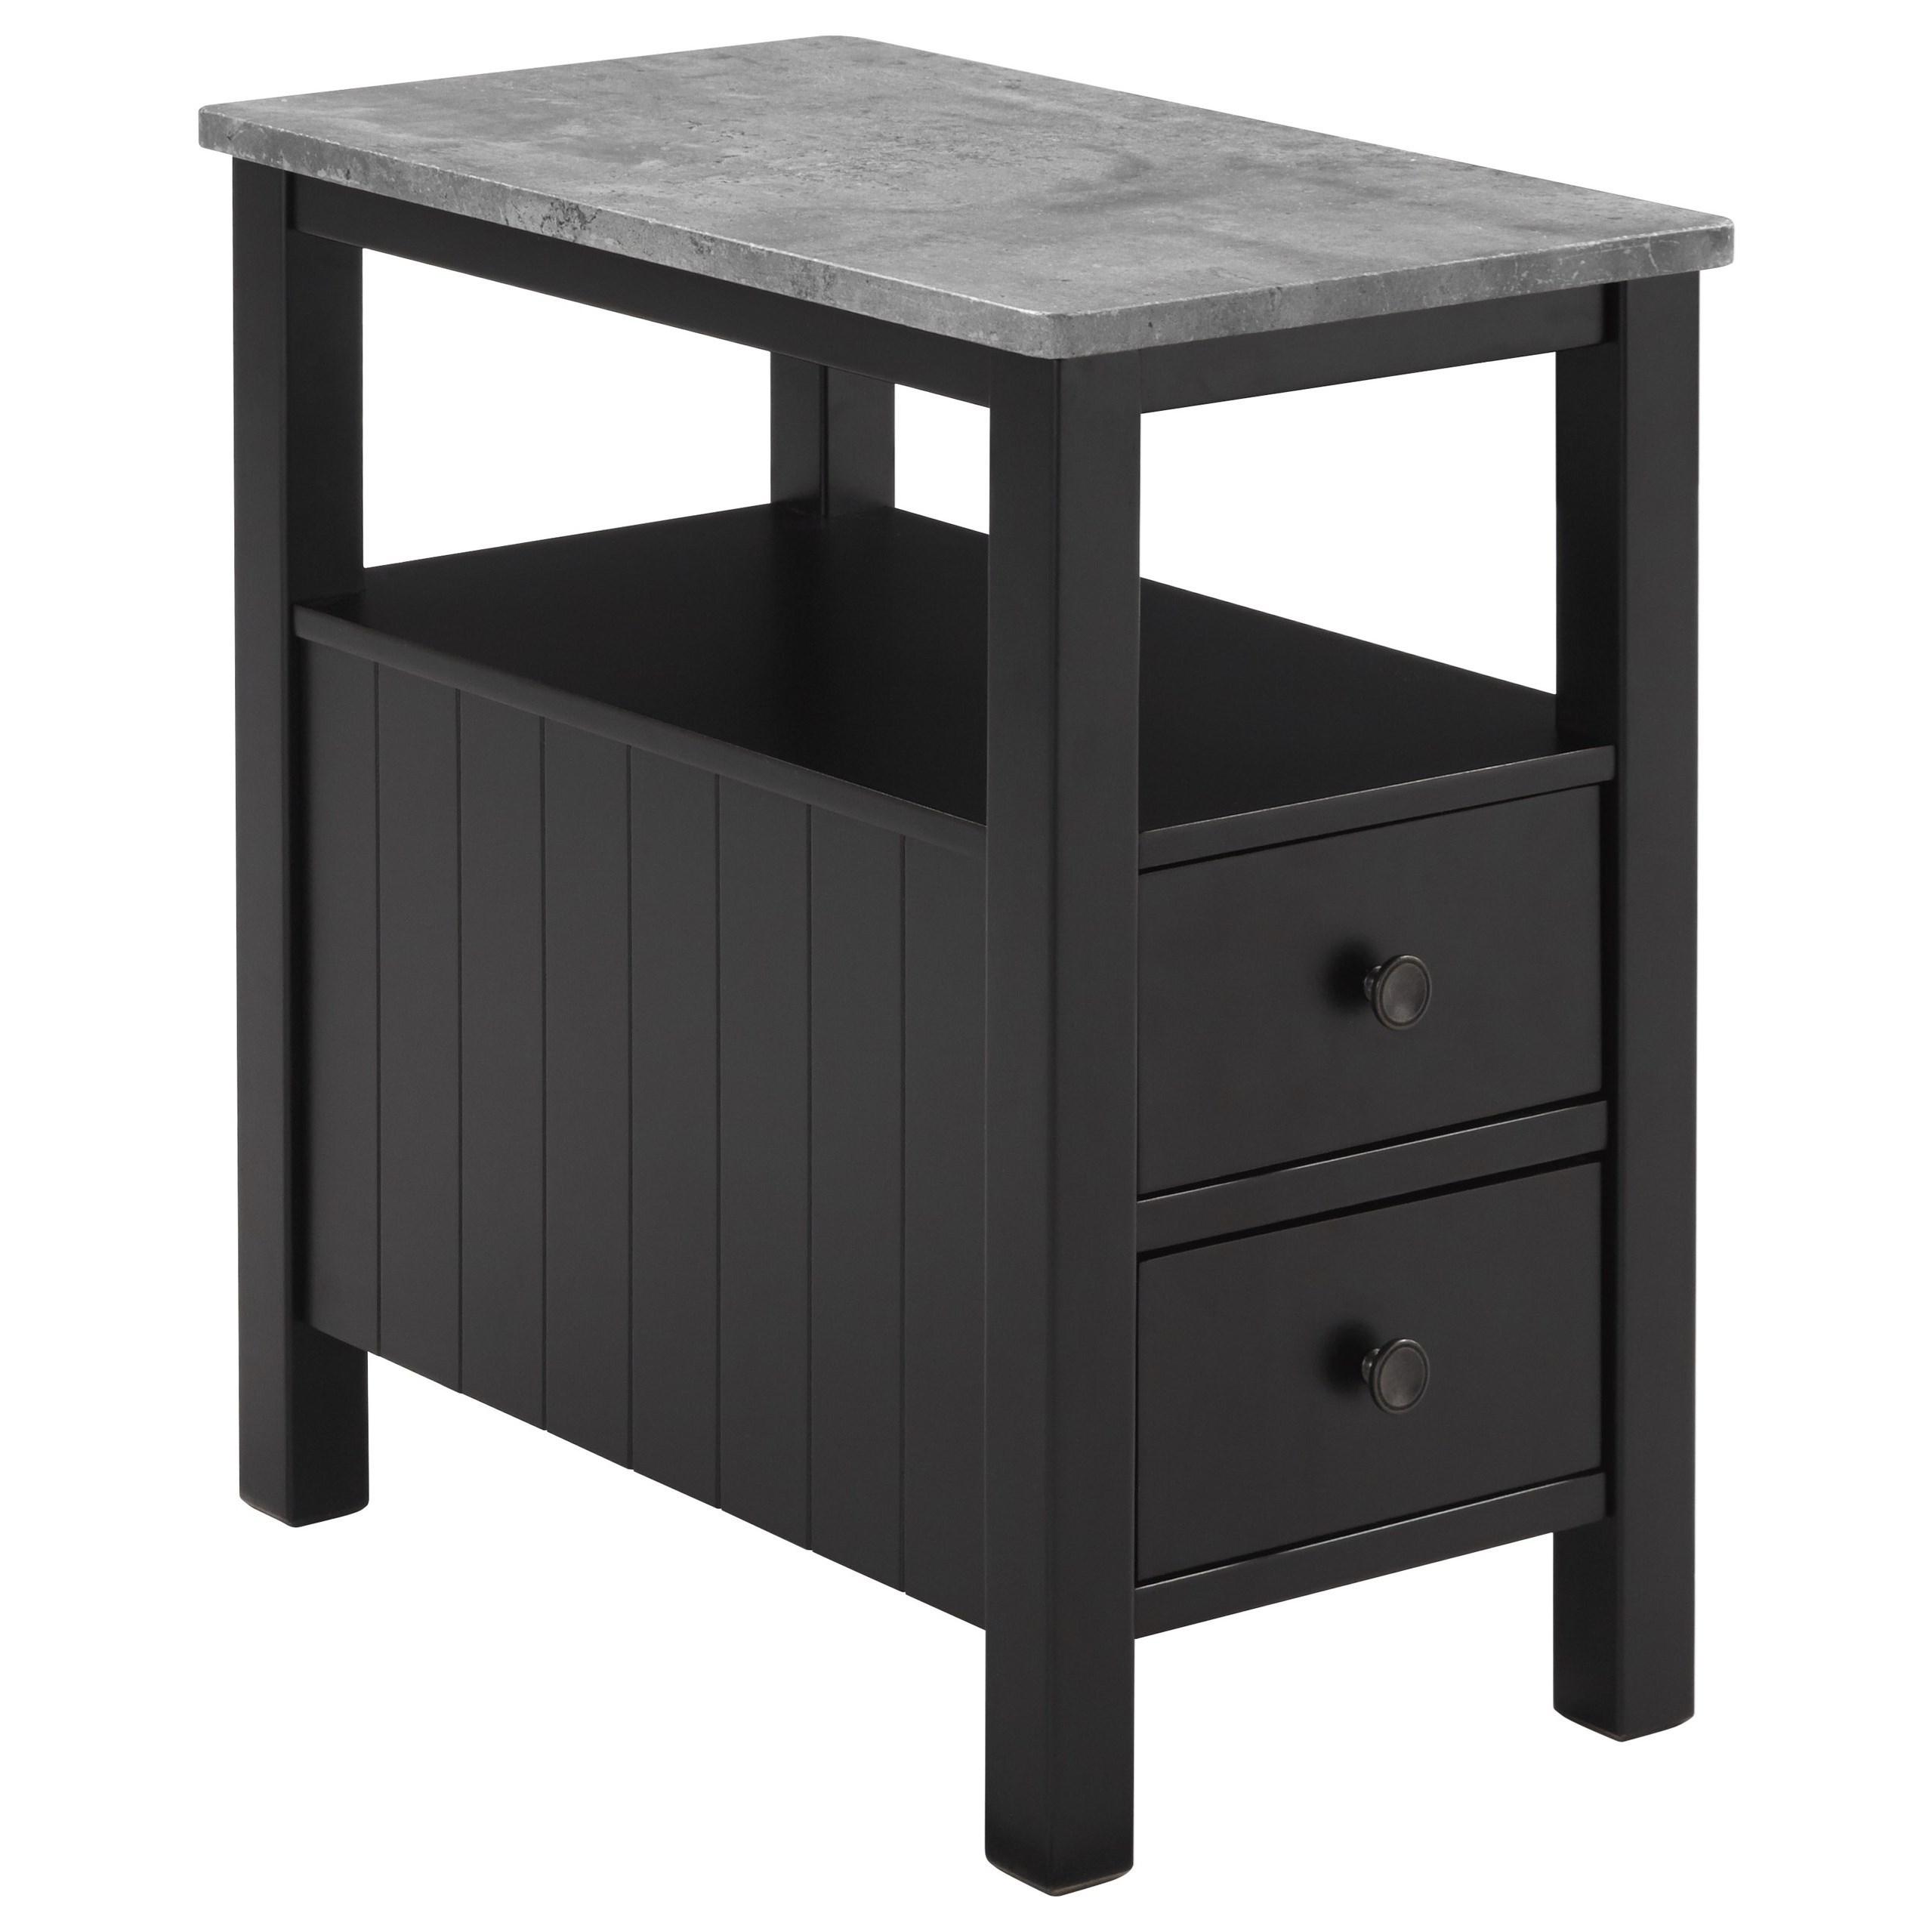 Ezmonei Chair Side End Table